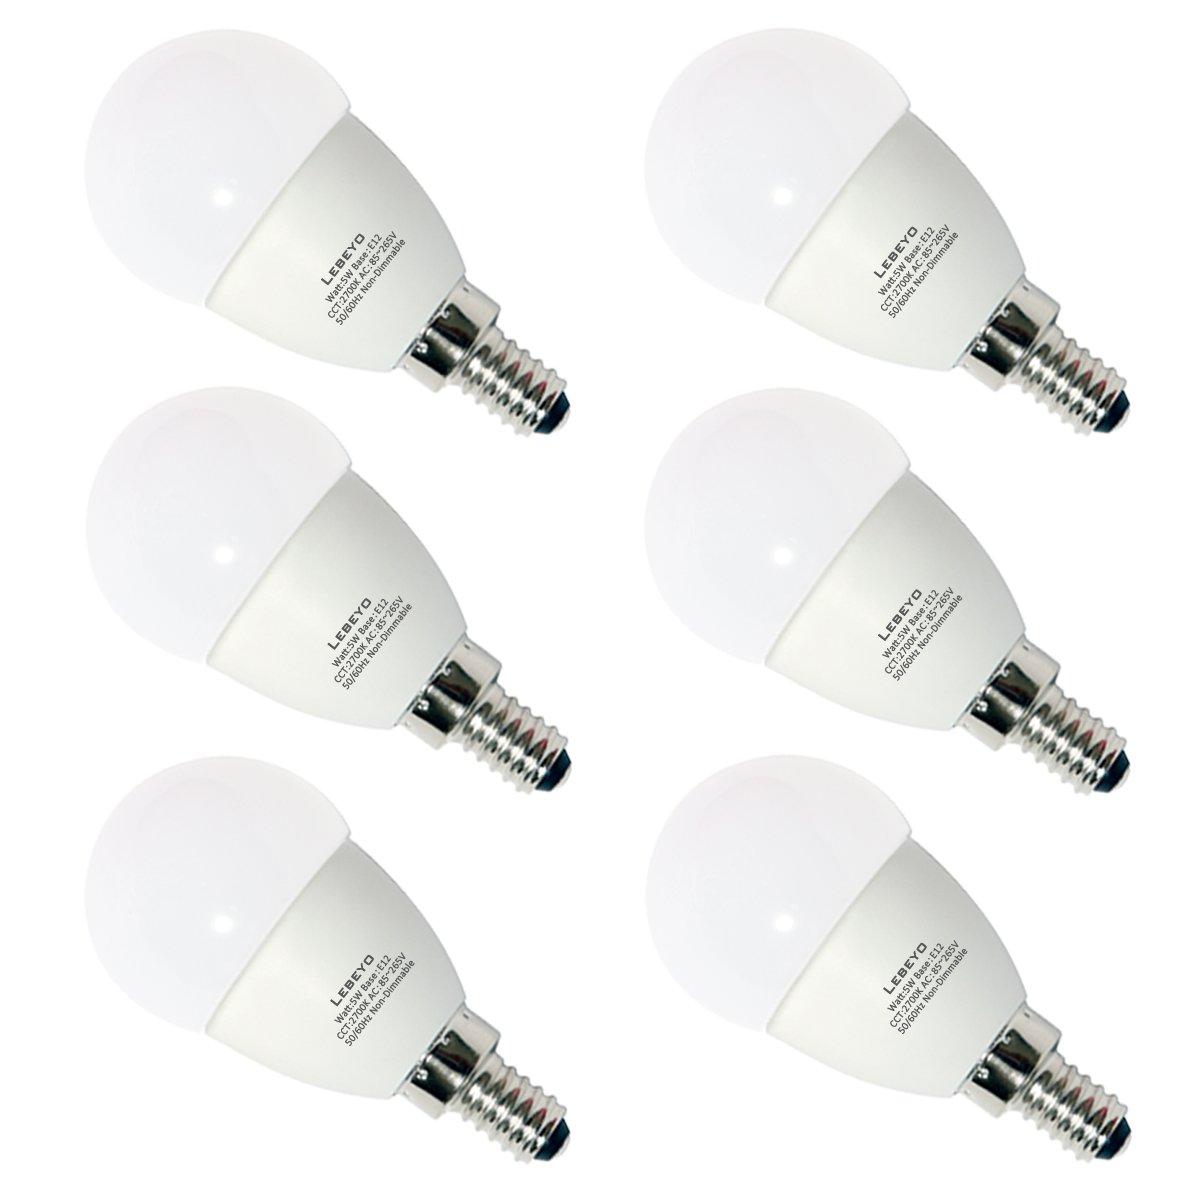 lebeyo e12 LED g45電球ランプ5 W 50 W相当燭台ウォームホワイト2700 K電球(gle12 – 04 ,パックof 6 ) B07CVRJNDD